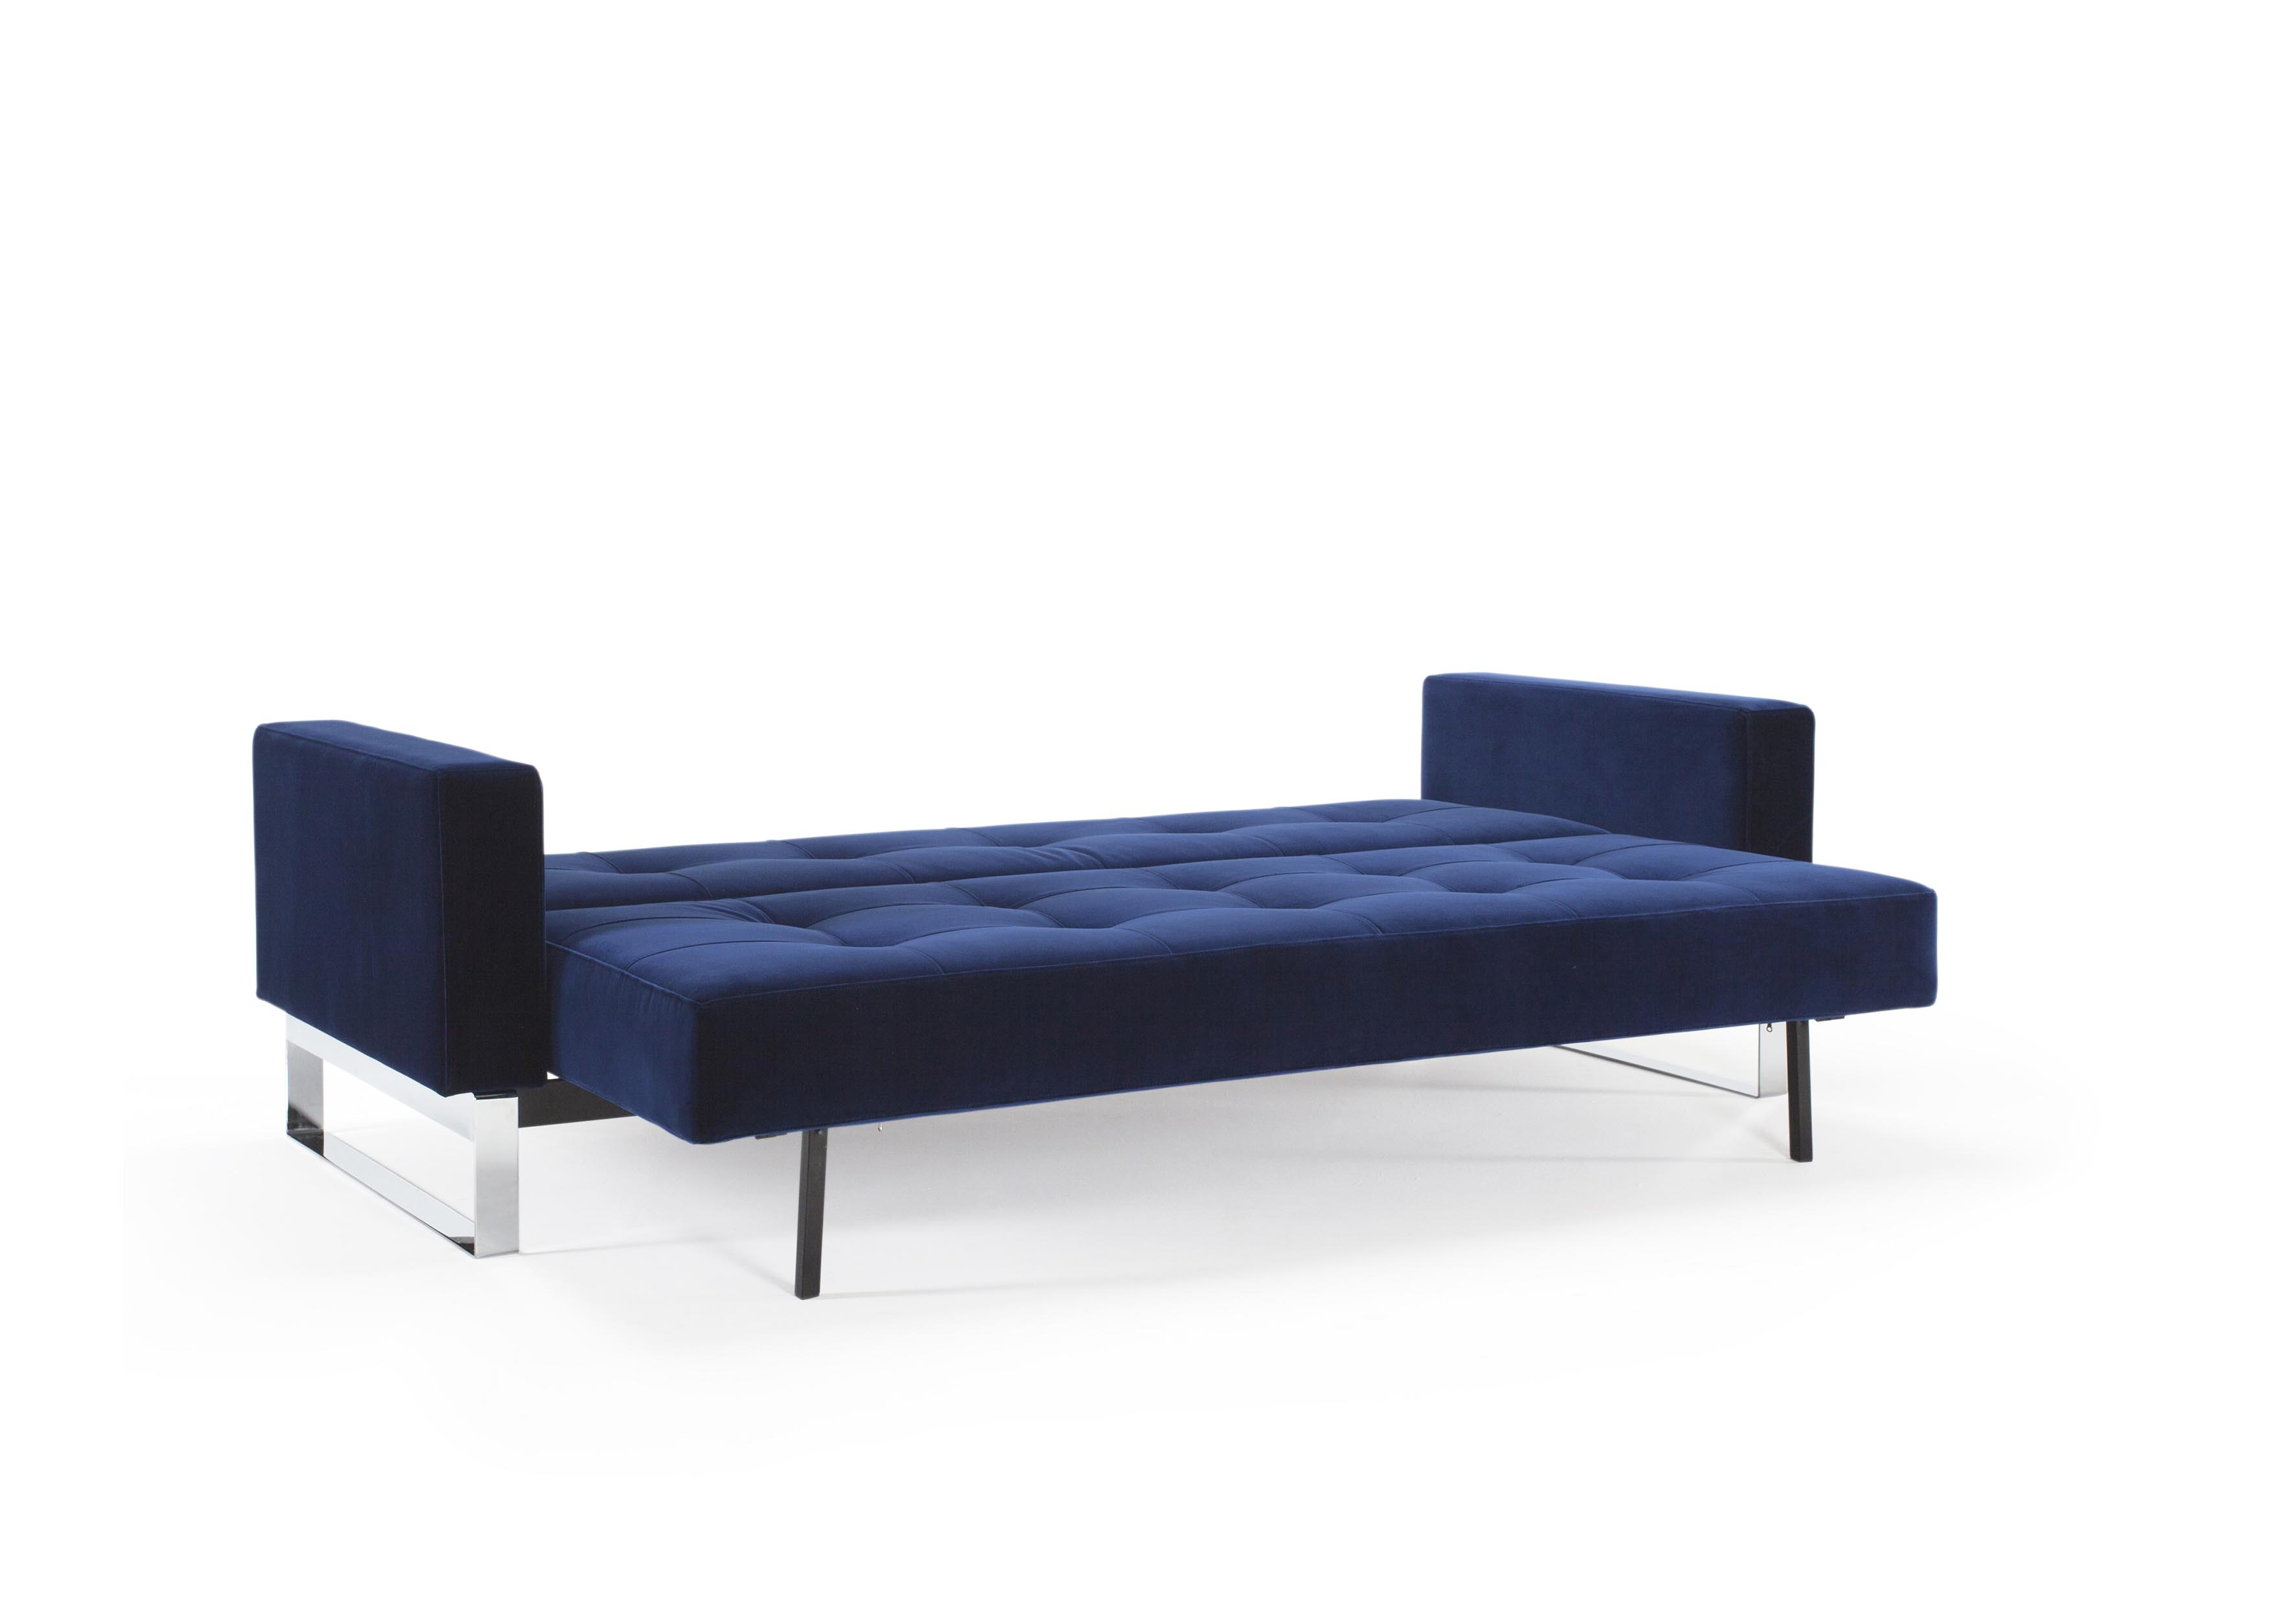 Cassius velvet sofa bed full size vintage velvet blue by for Complete divan beds